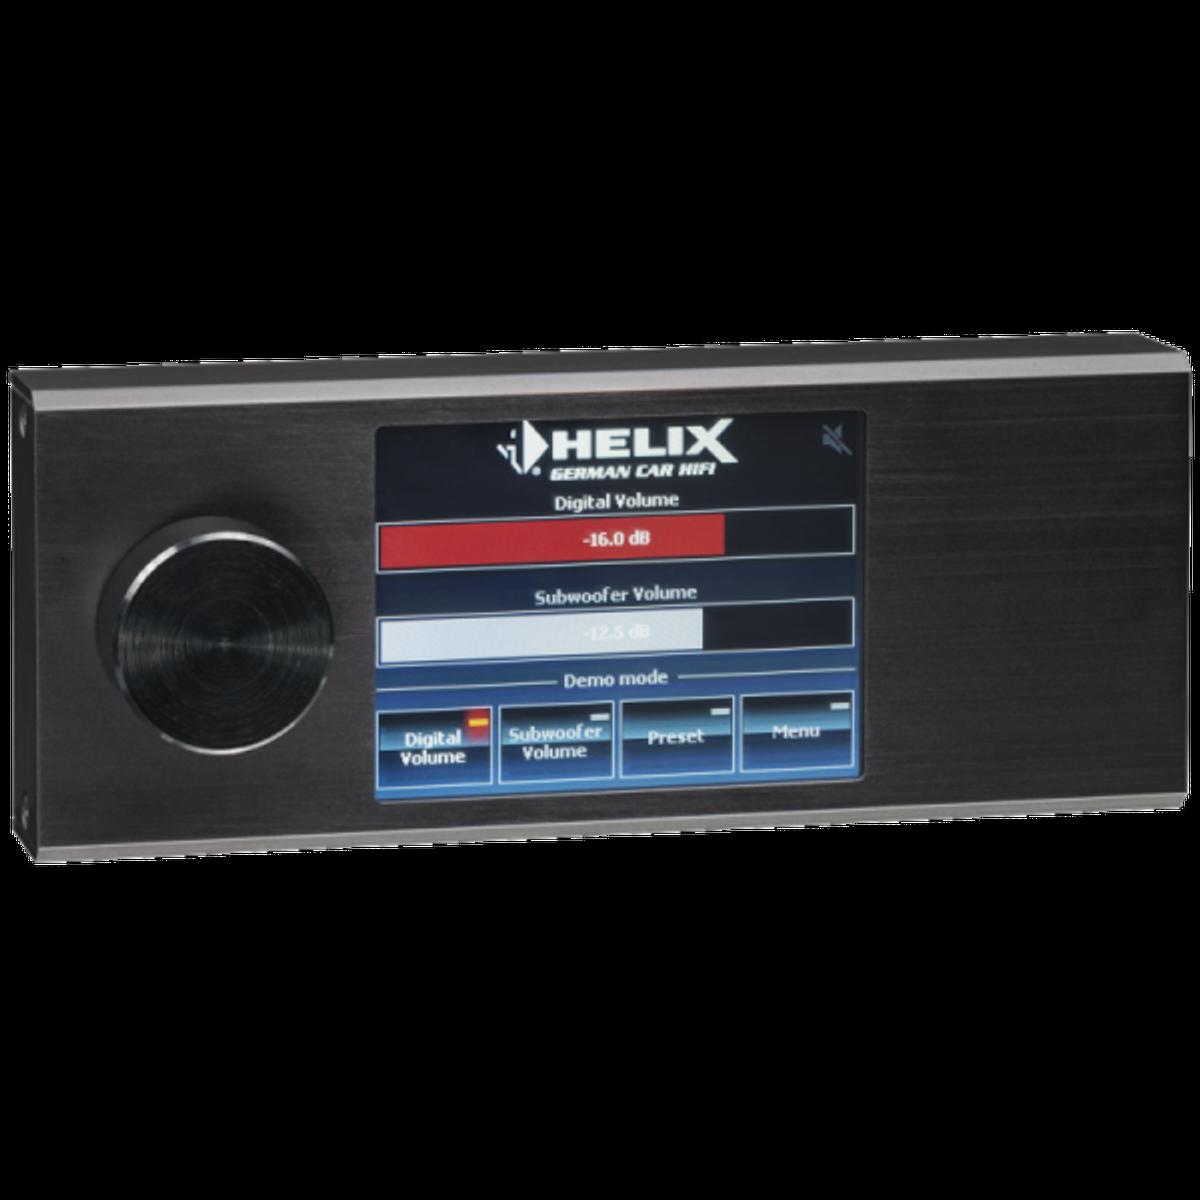 Helix Director Remote